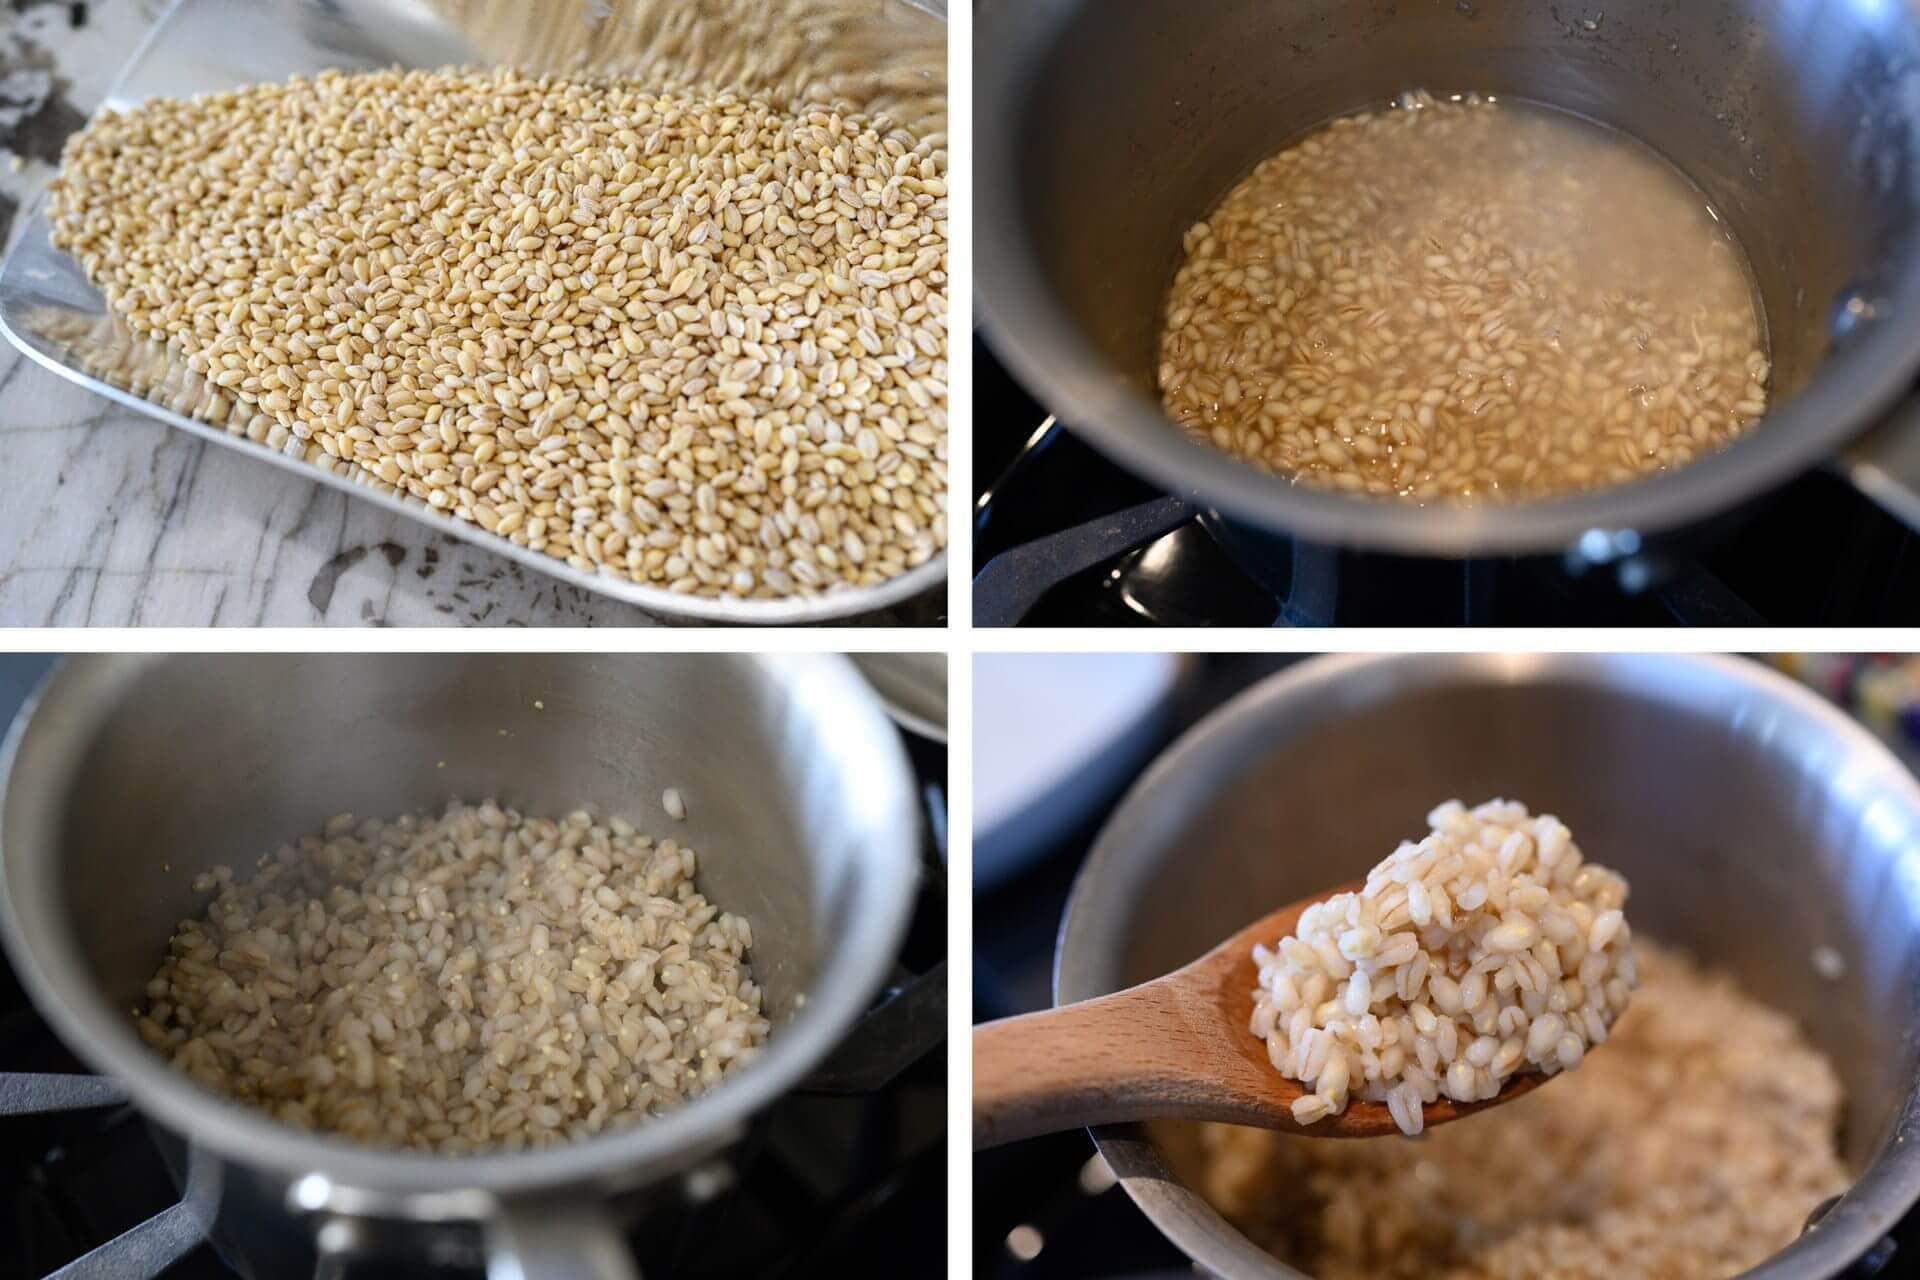 Hulled barley and barley porridge